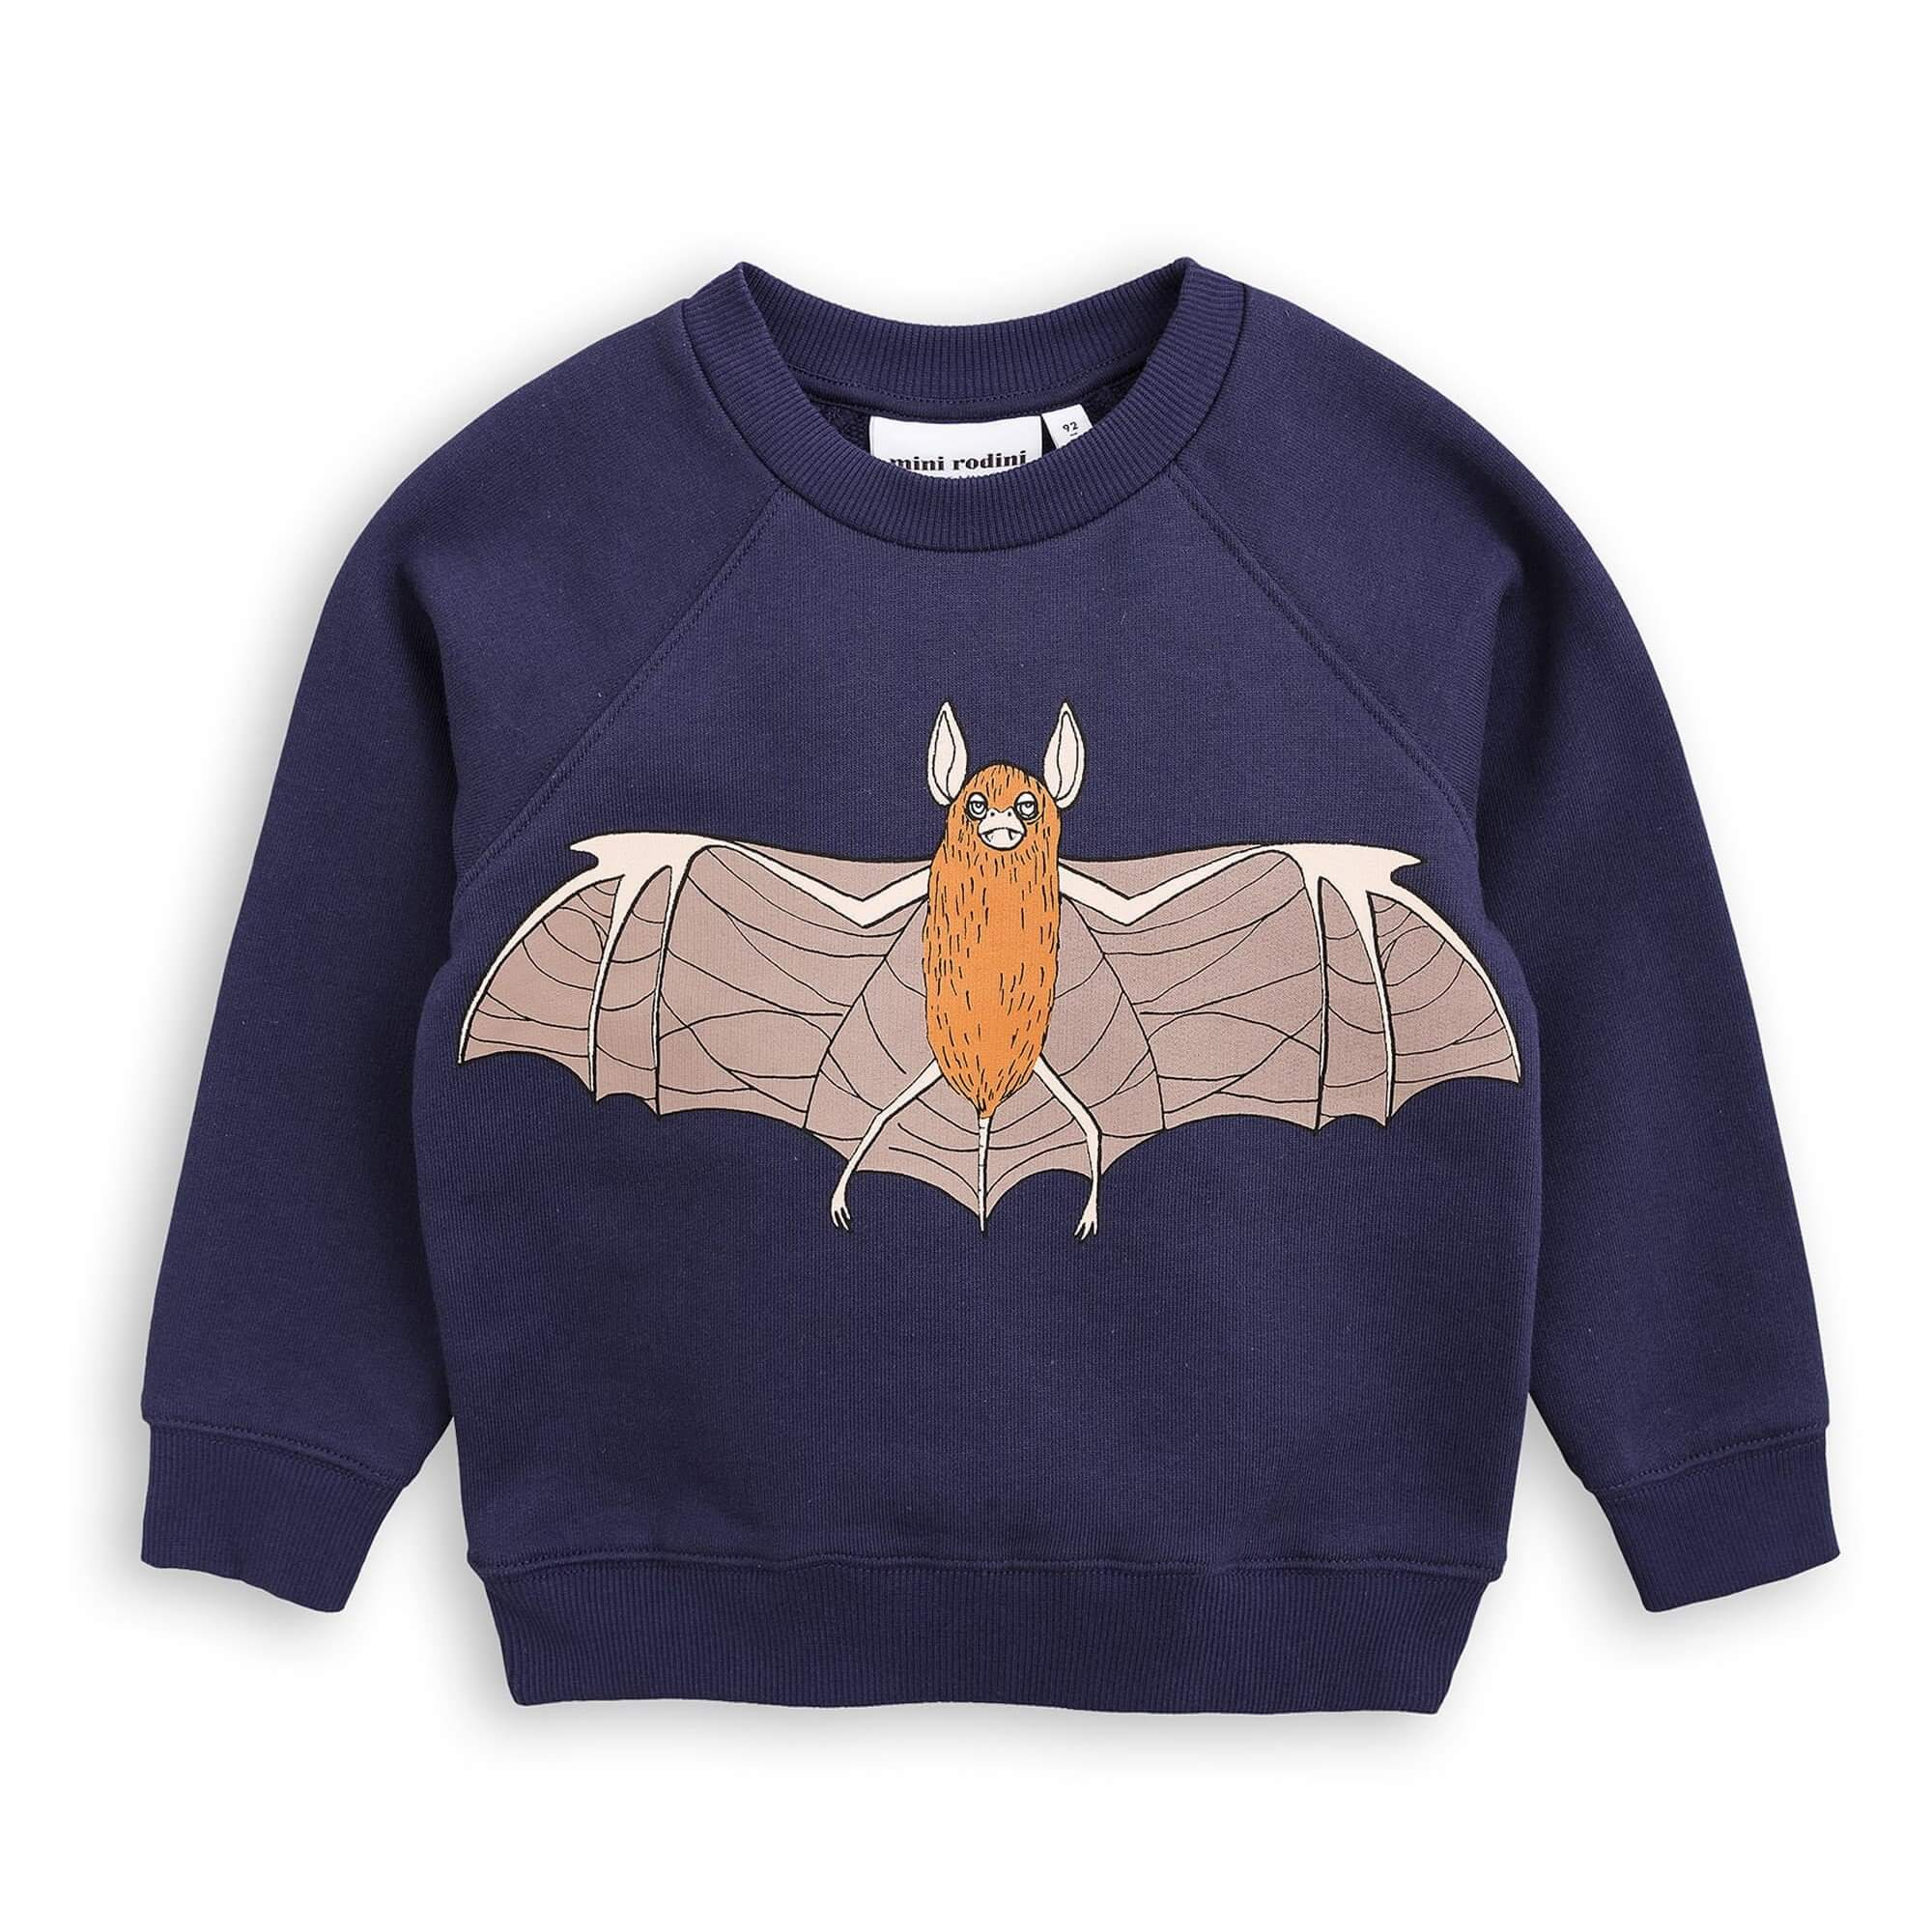 "MINI RODINI Sweatshirt ""Fledermaus"", Biobaumwolle"